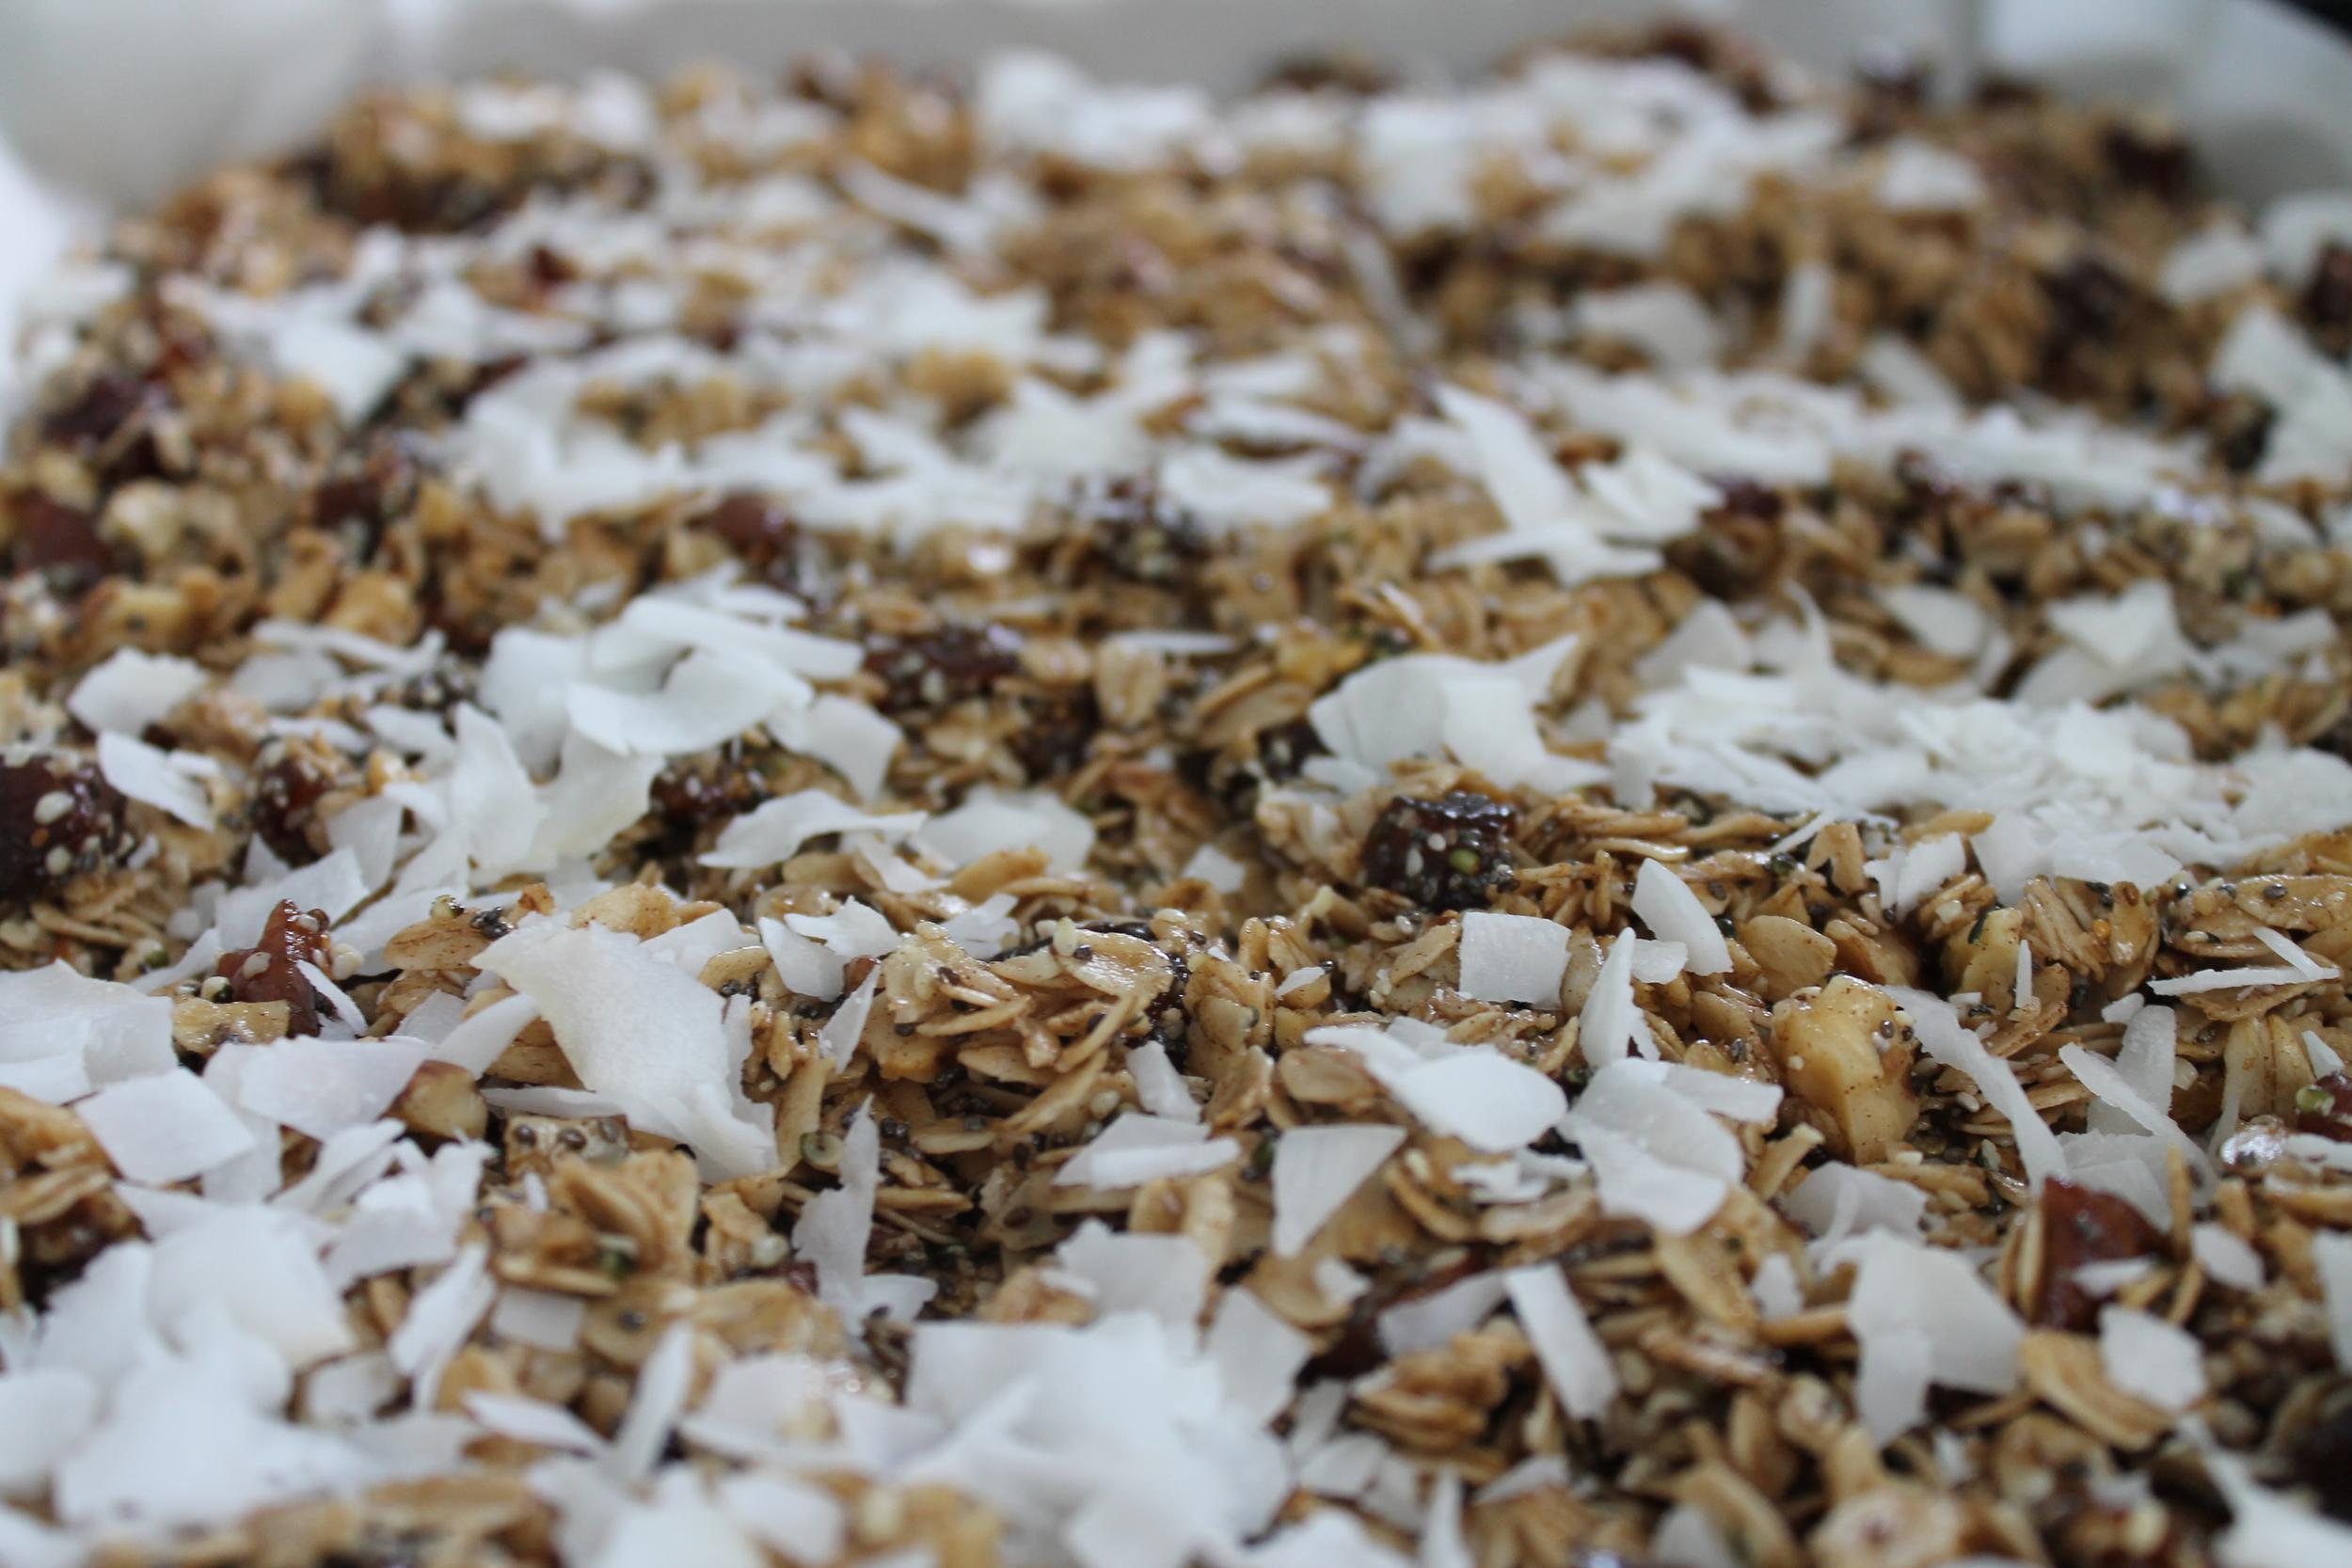 Gluten-free, vegan and refined sugar-free Fig & Apricot Mediterranean Granola recipe from Ferns & Peonies. Find this gluten-free and vegan recipe and more at www.fernsandpeonies.com